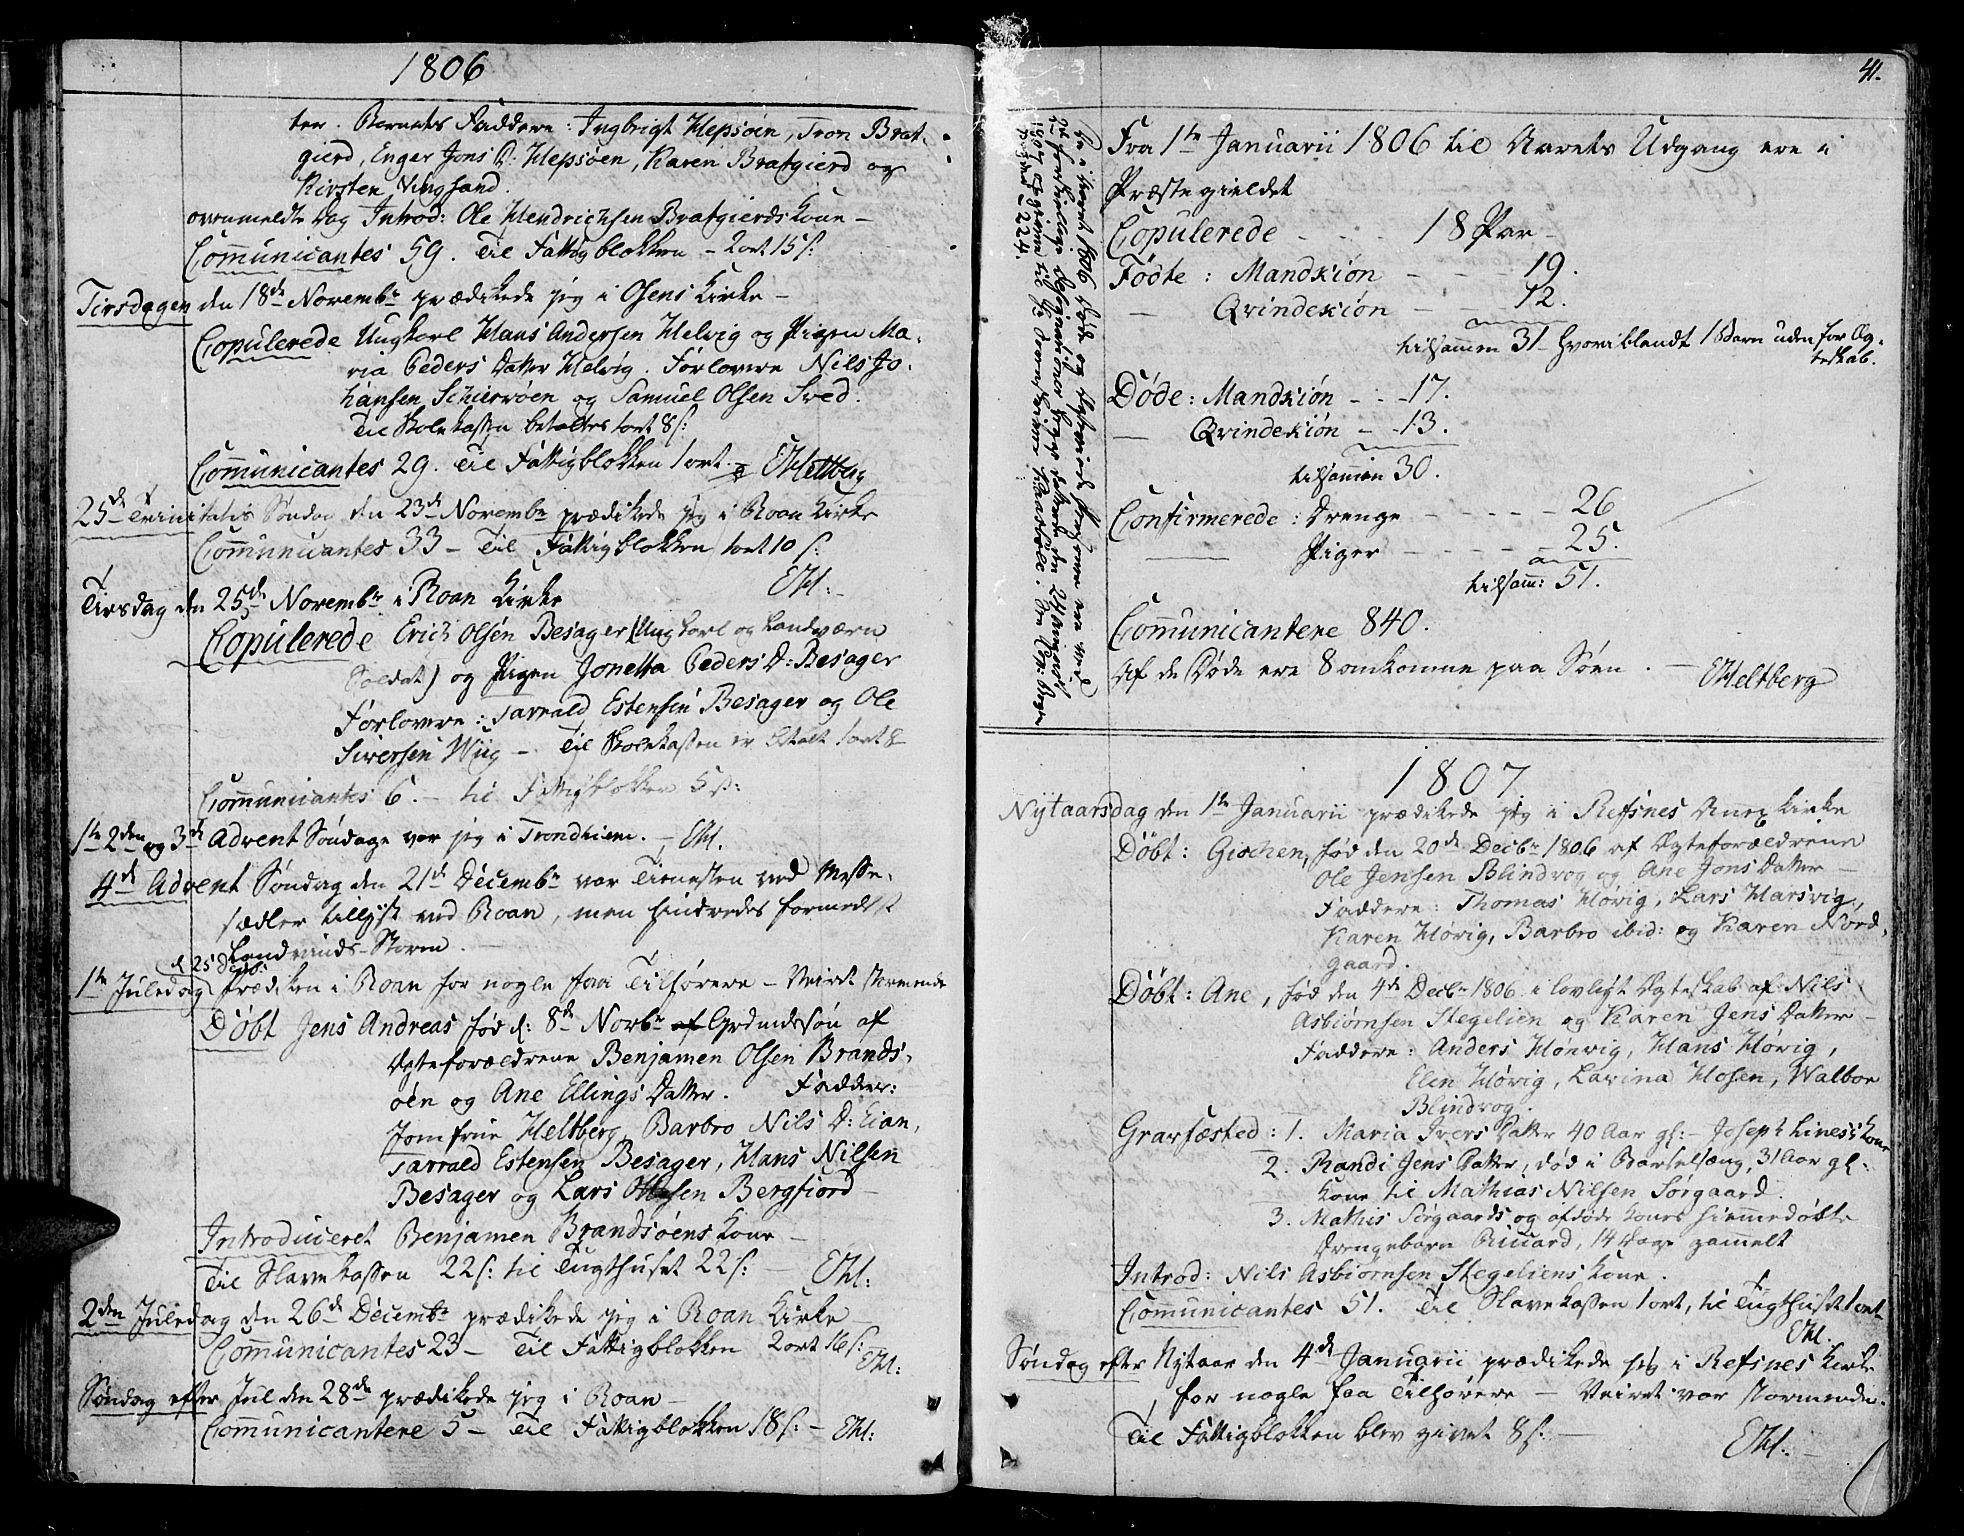 SAT, Ministerialprotokoller, klokkerbøker og fødselsregistre - Sør-Trøndelag, 657/L0701: Parish register (official) no. 657A02, 1802-1831, p. 41